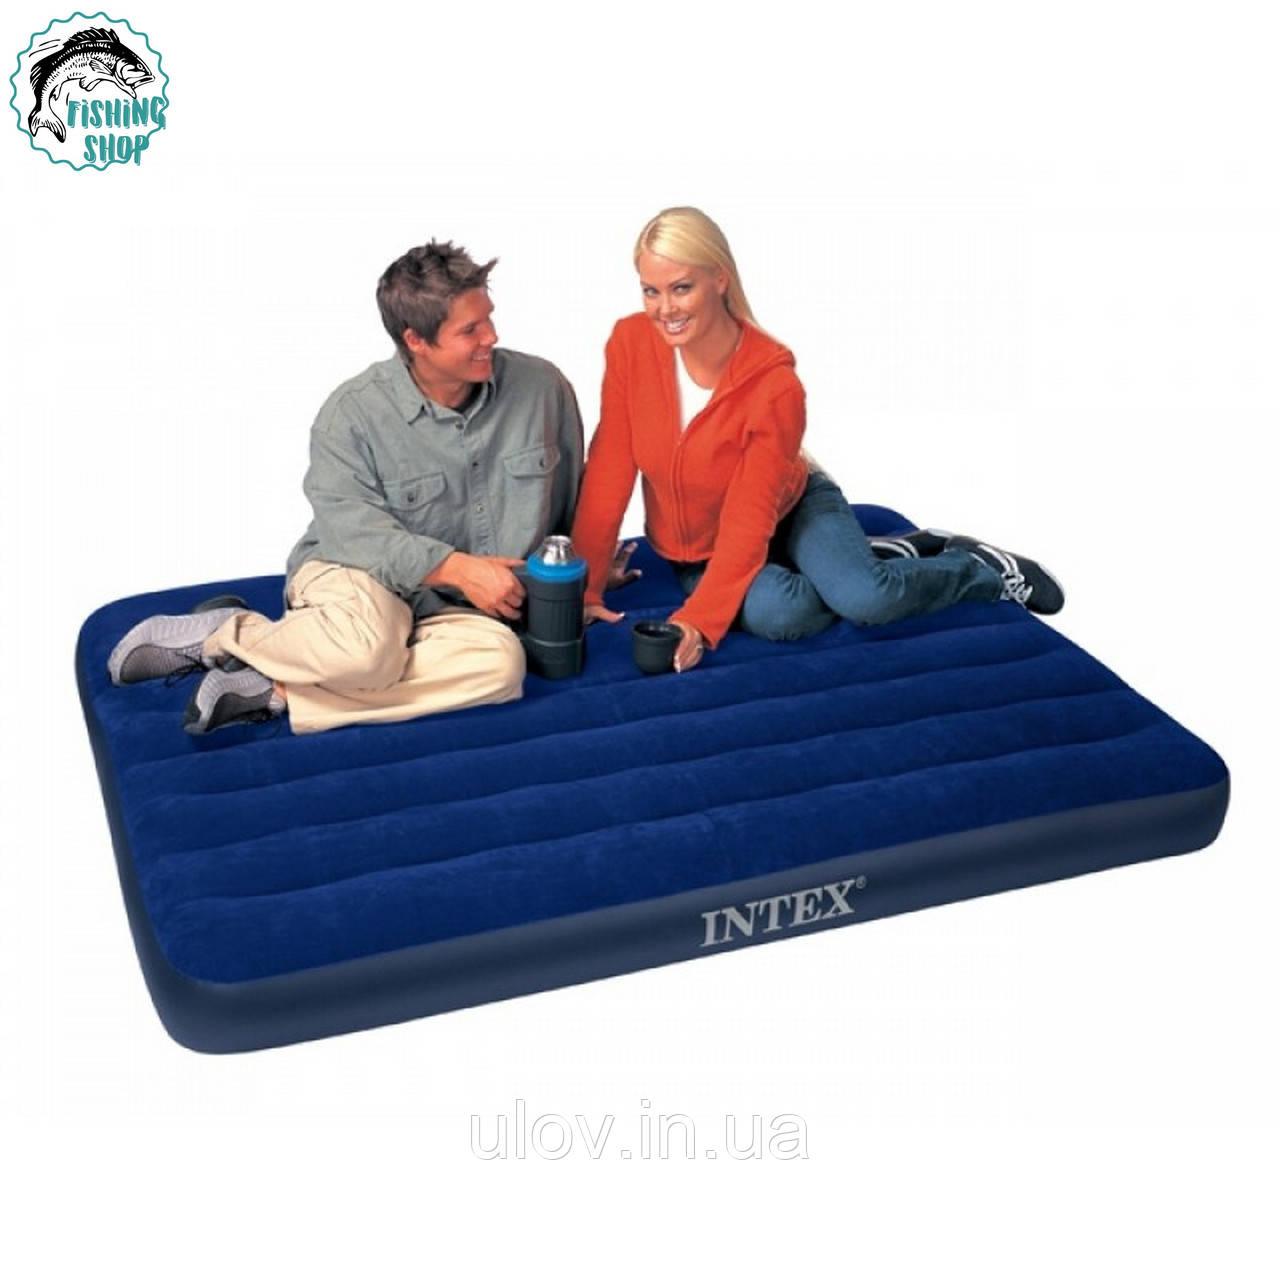 Матрас двуспальный надувной Intex 68758 (193х137х22 см)